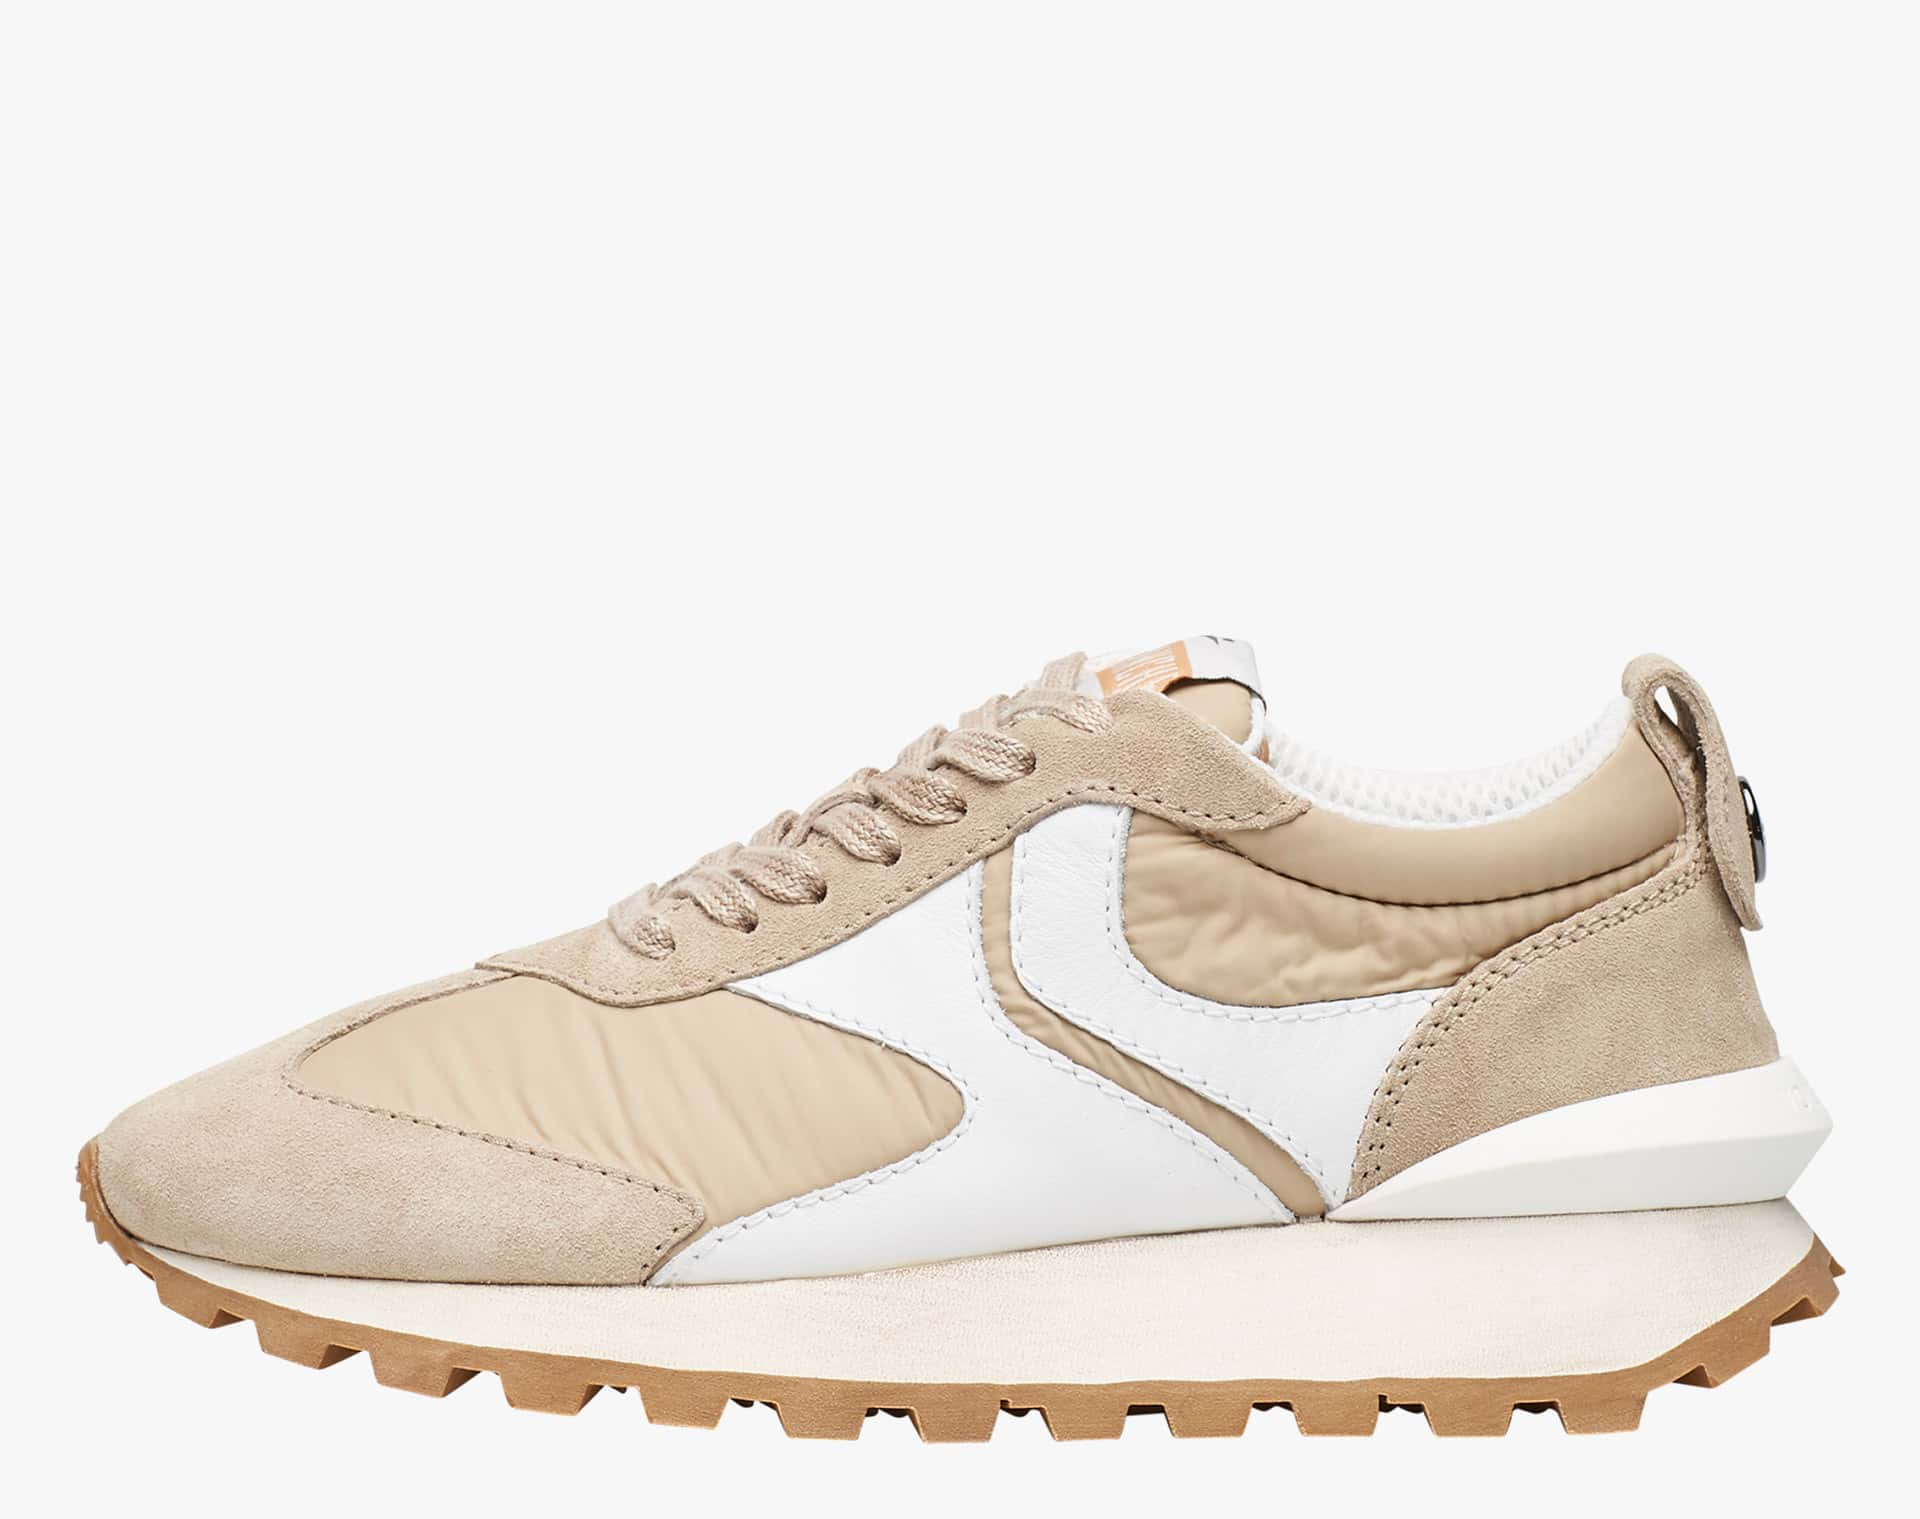 Sneaker in tessuto tecnico, suede e pelle Beige-QWARK WOMAN